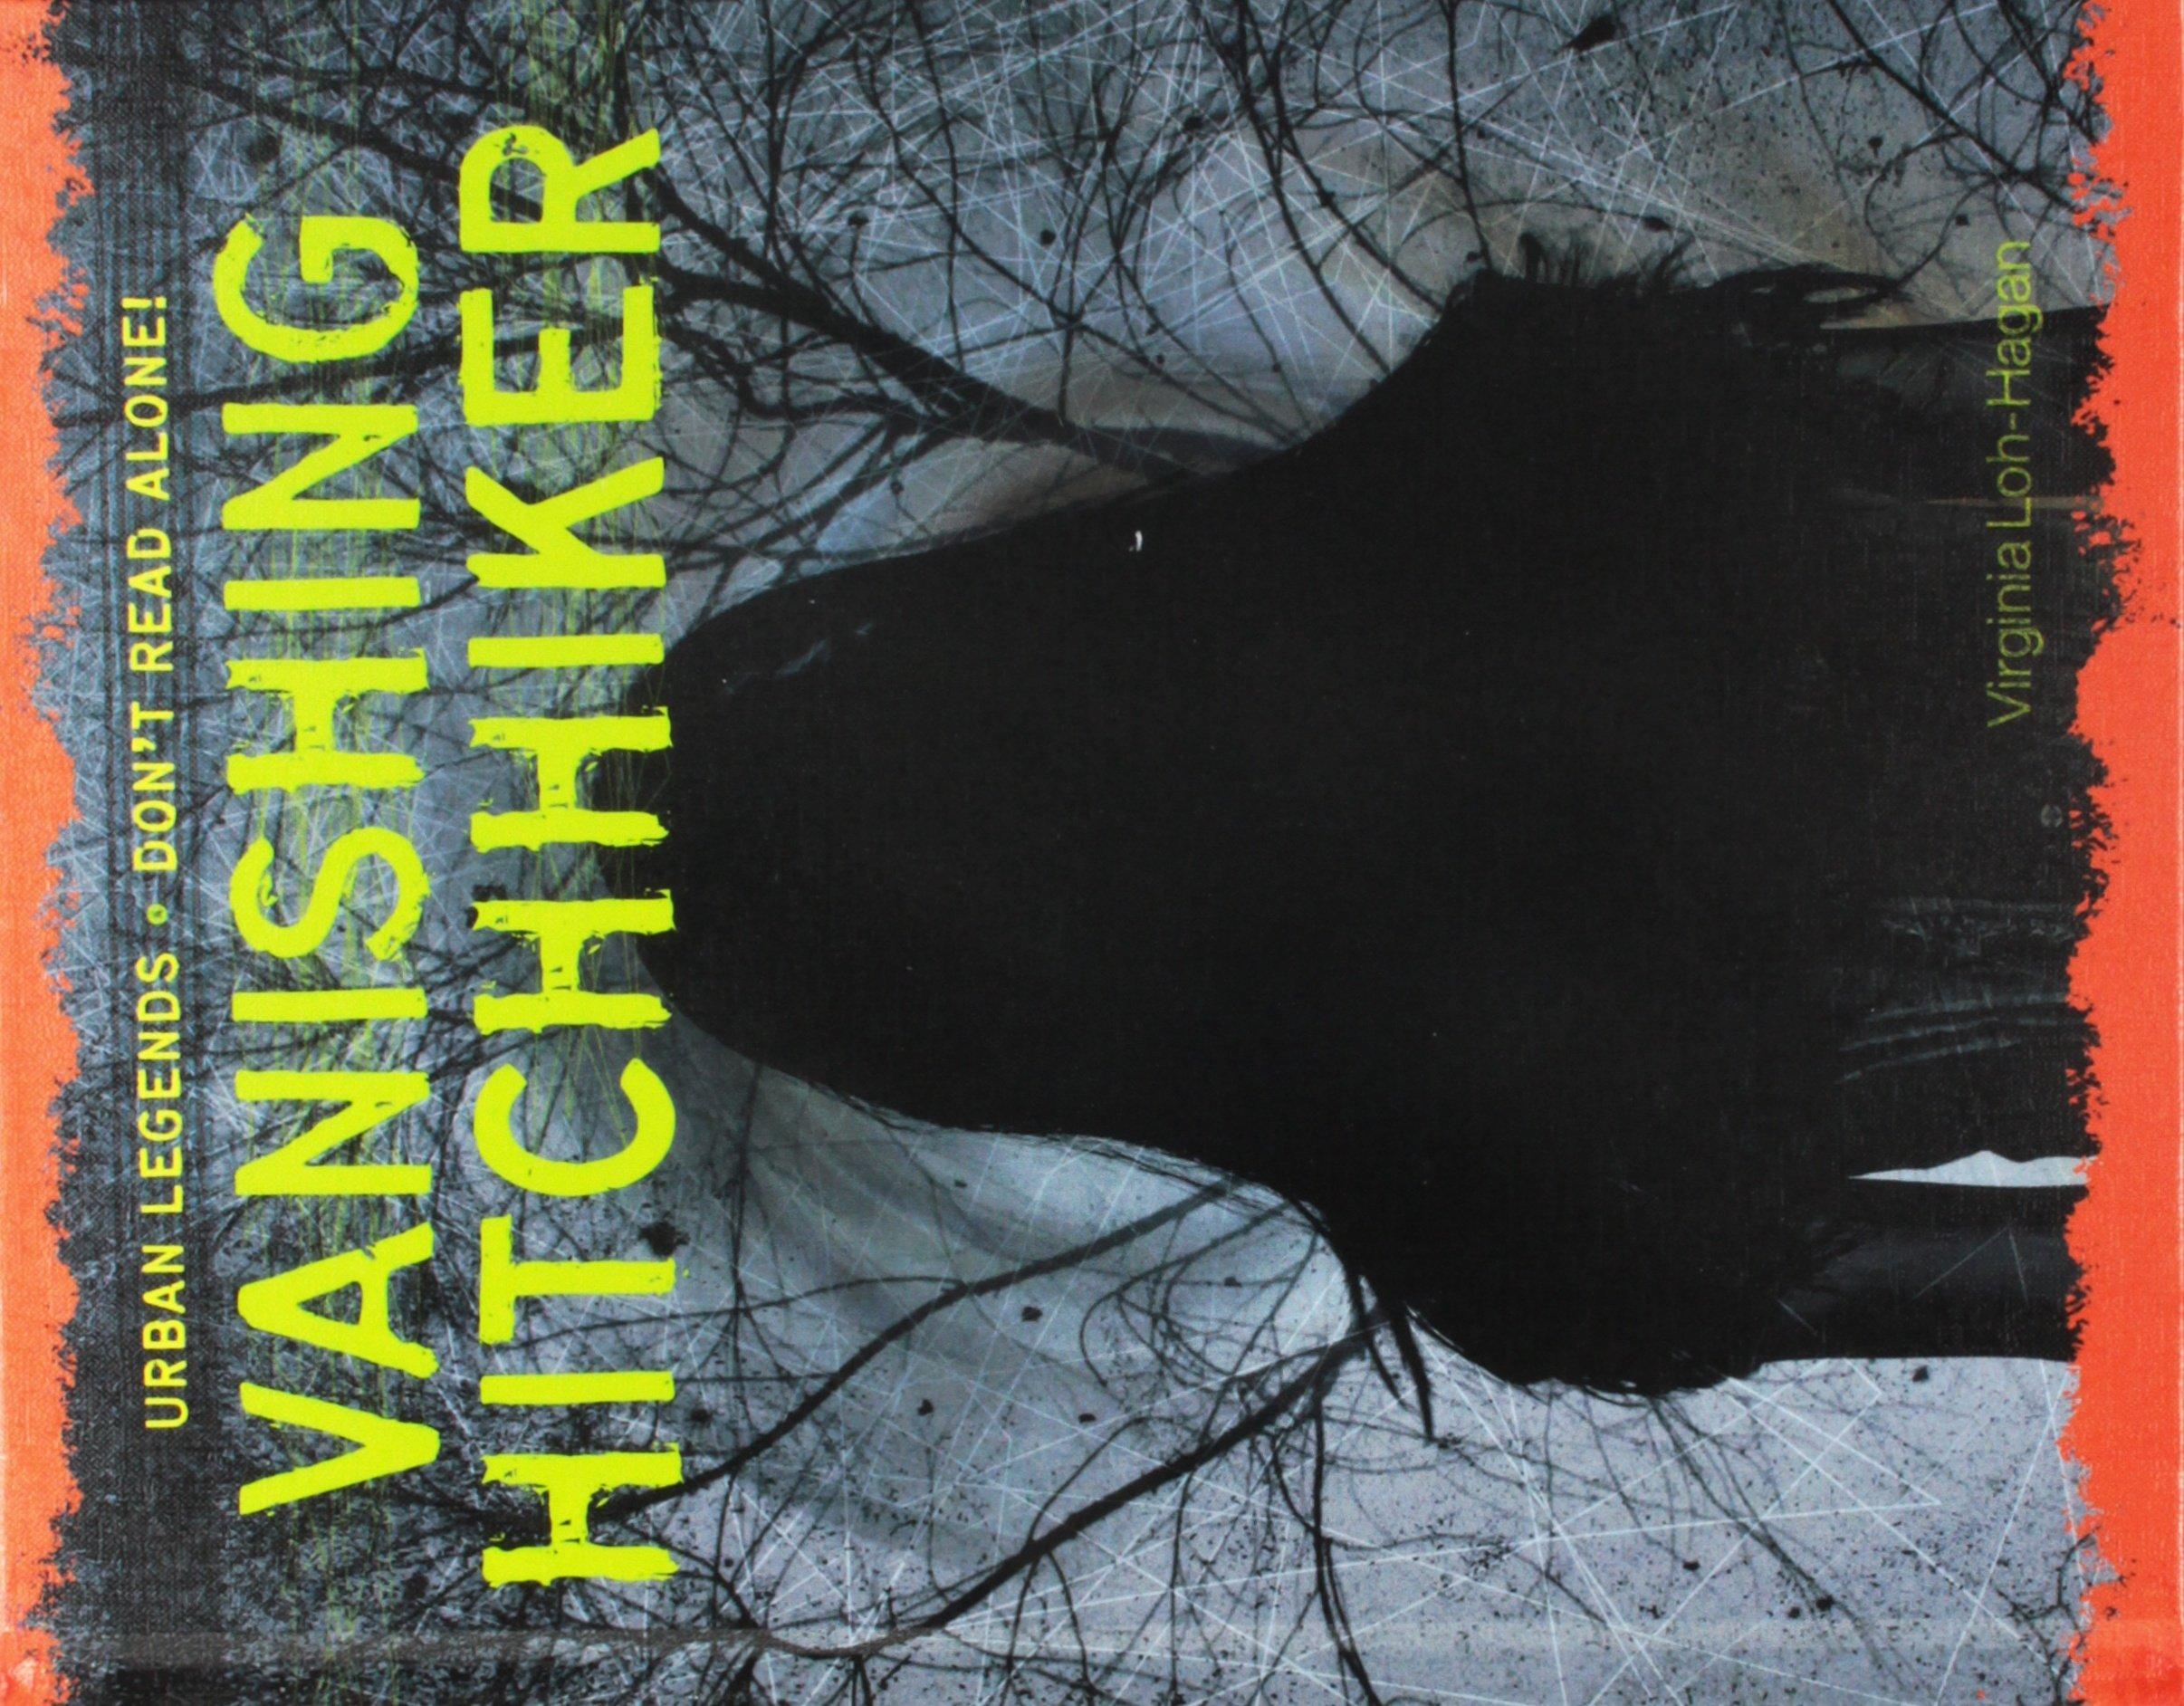 Vanishing Hitchhiker (Urban Legends: Don't Read Alone!)